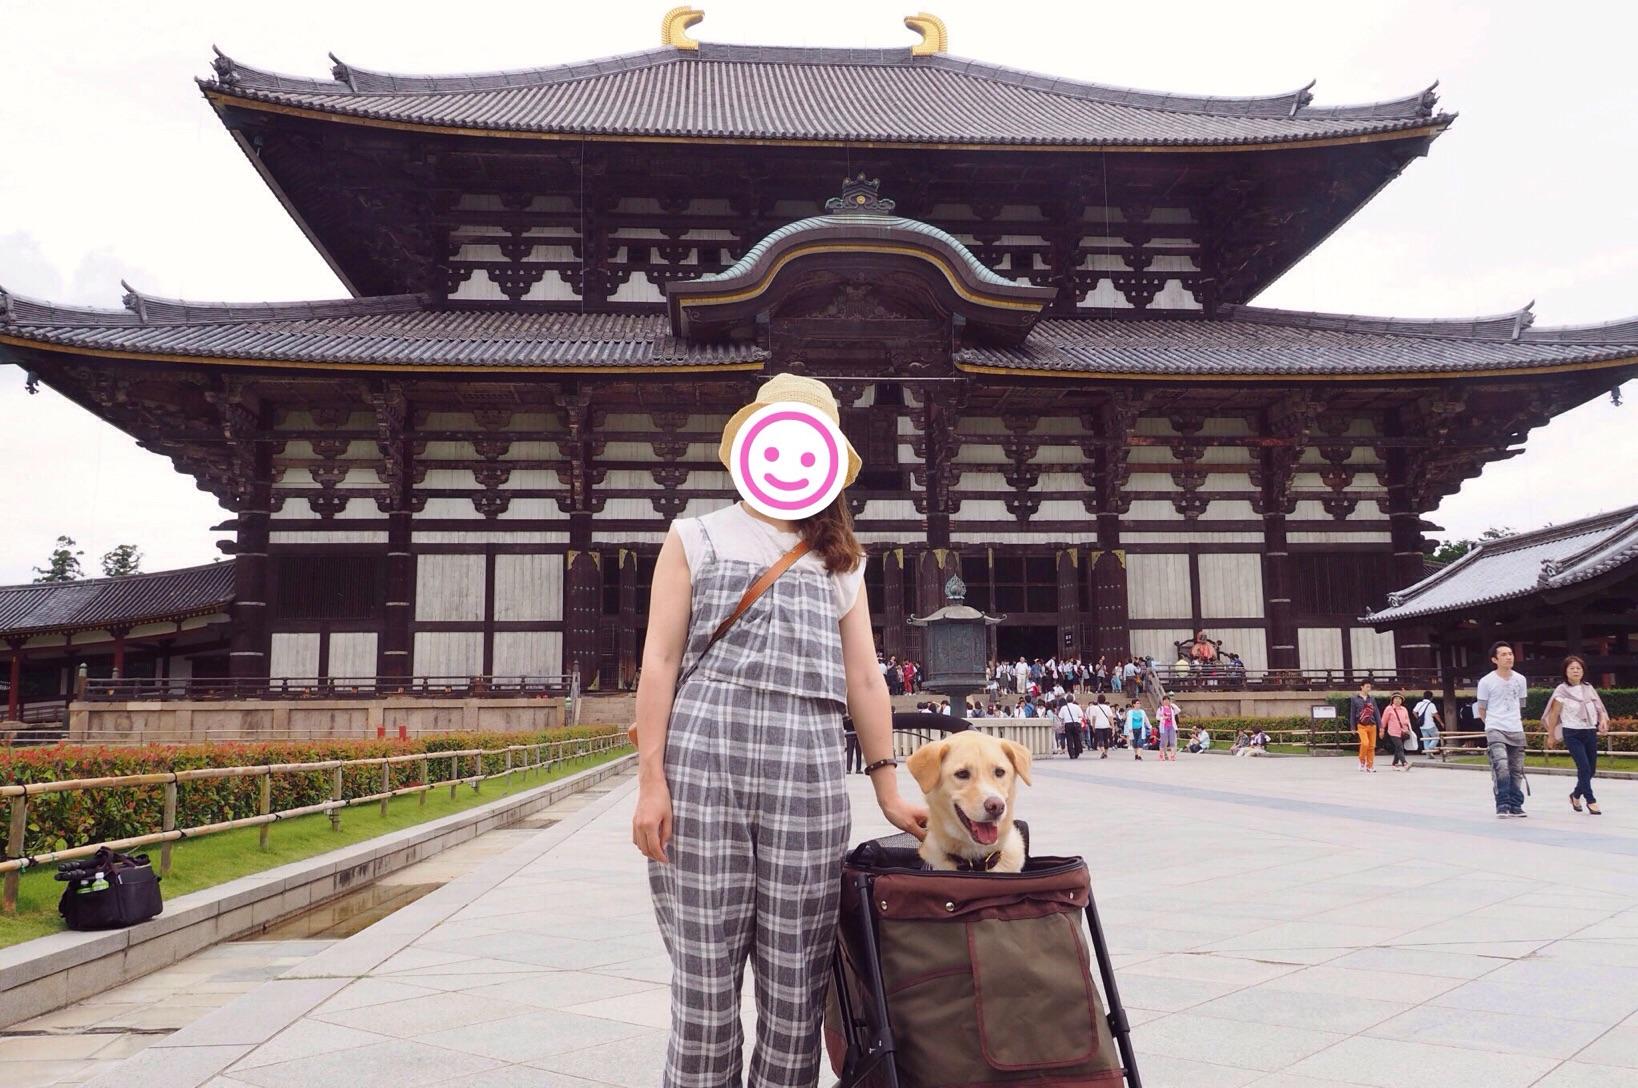 奈良の大仏 大型犬 大仏殿